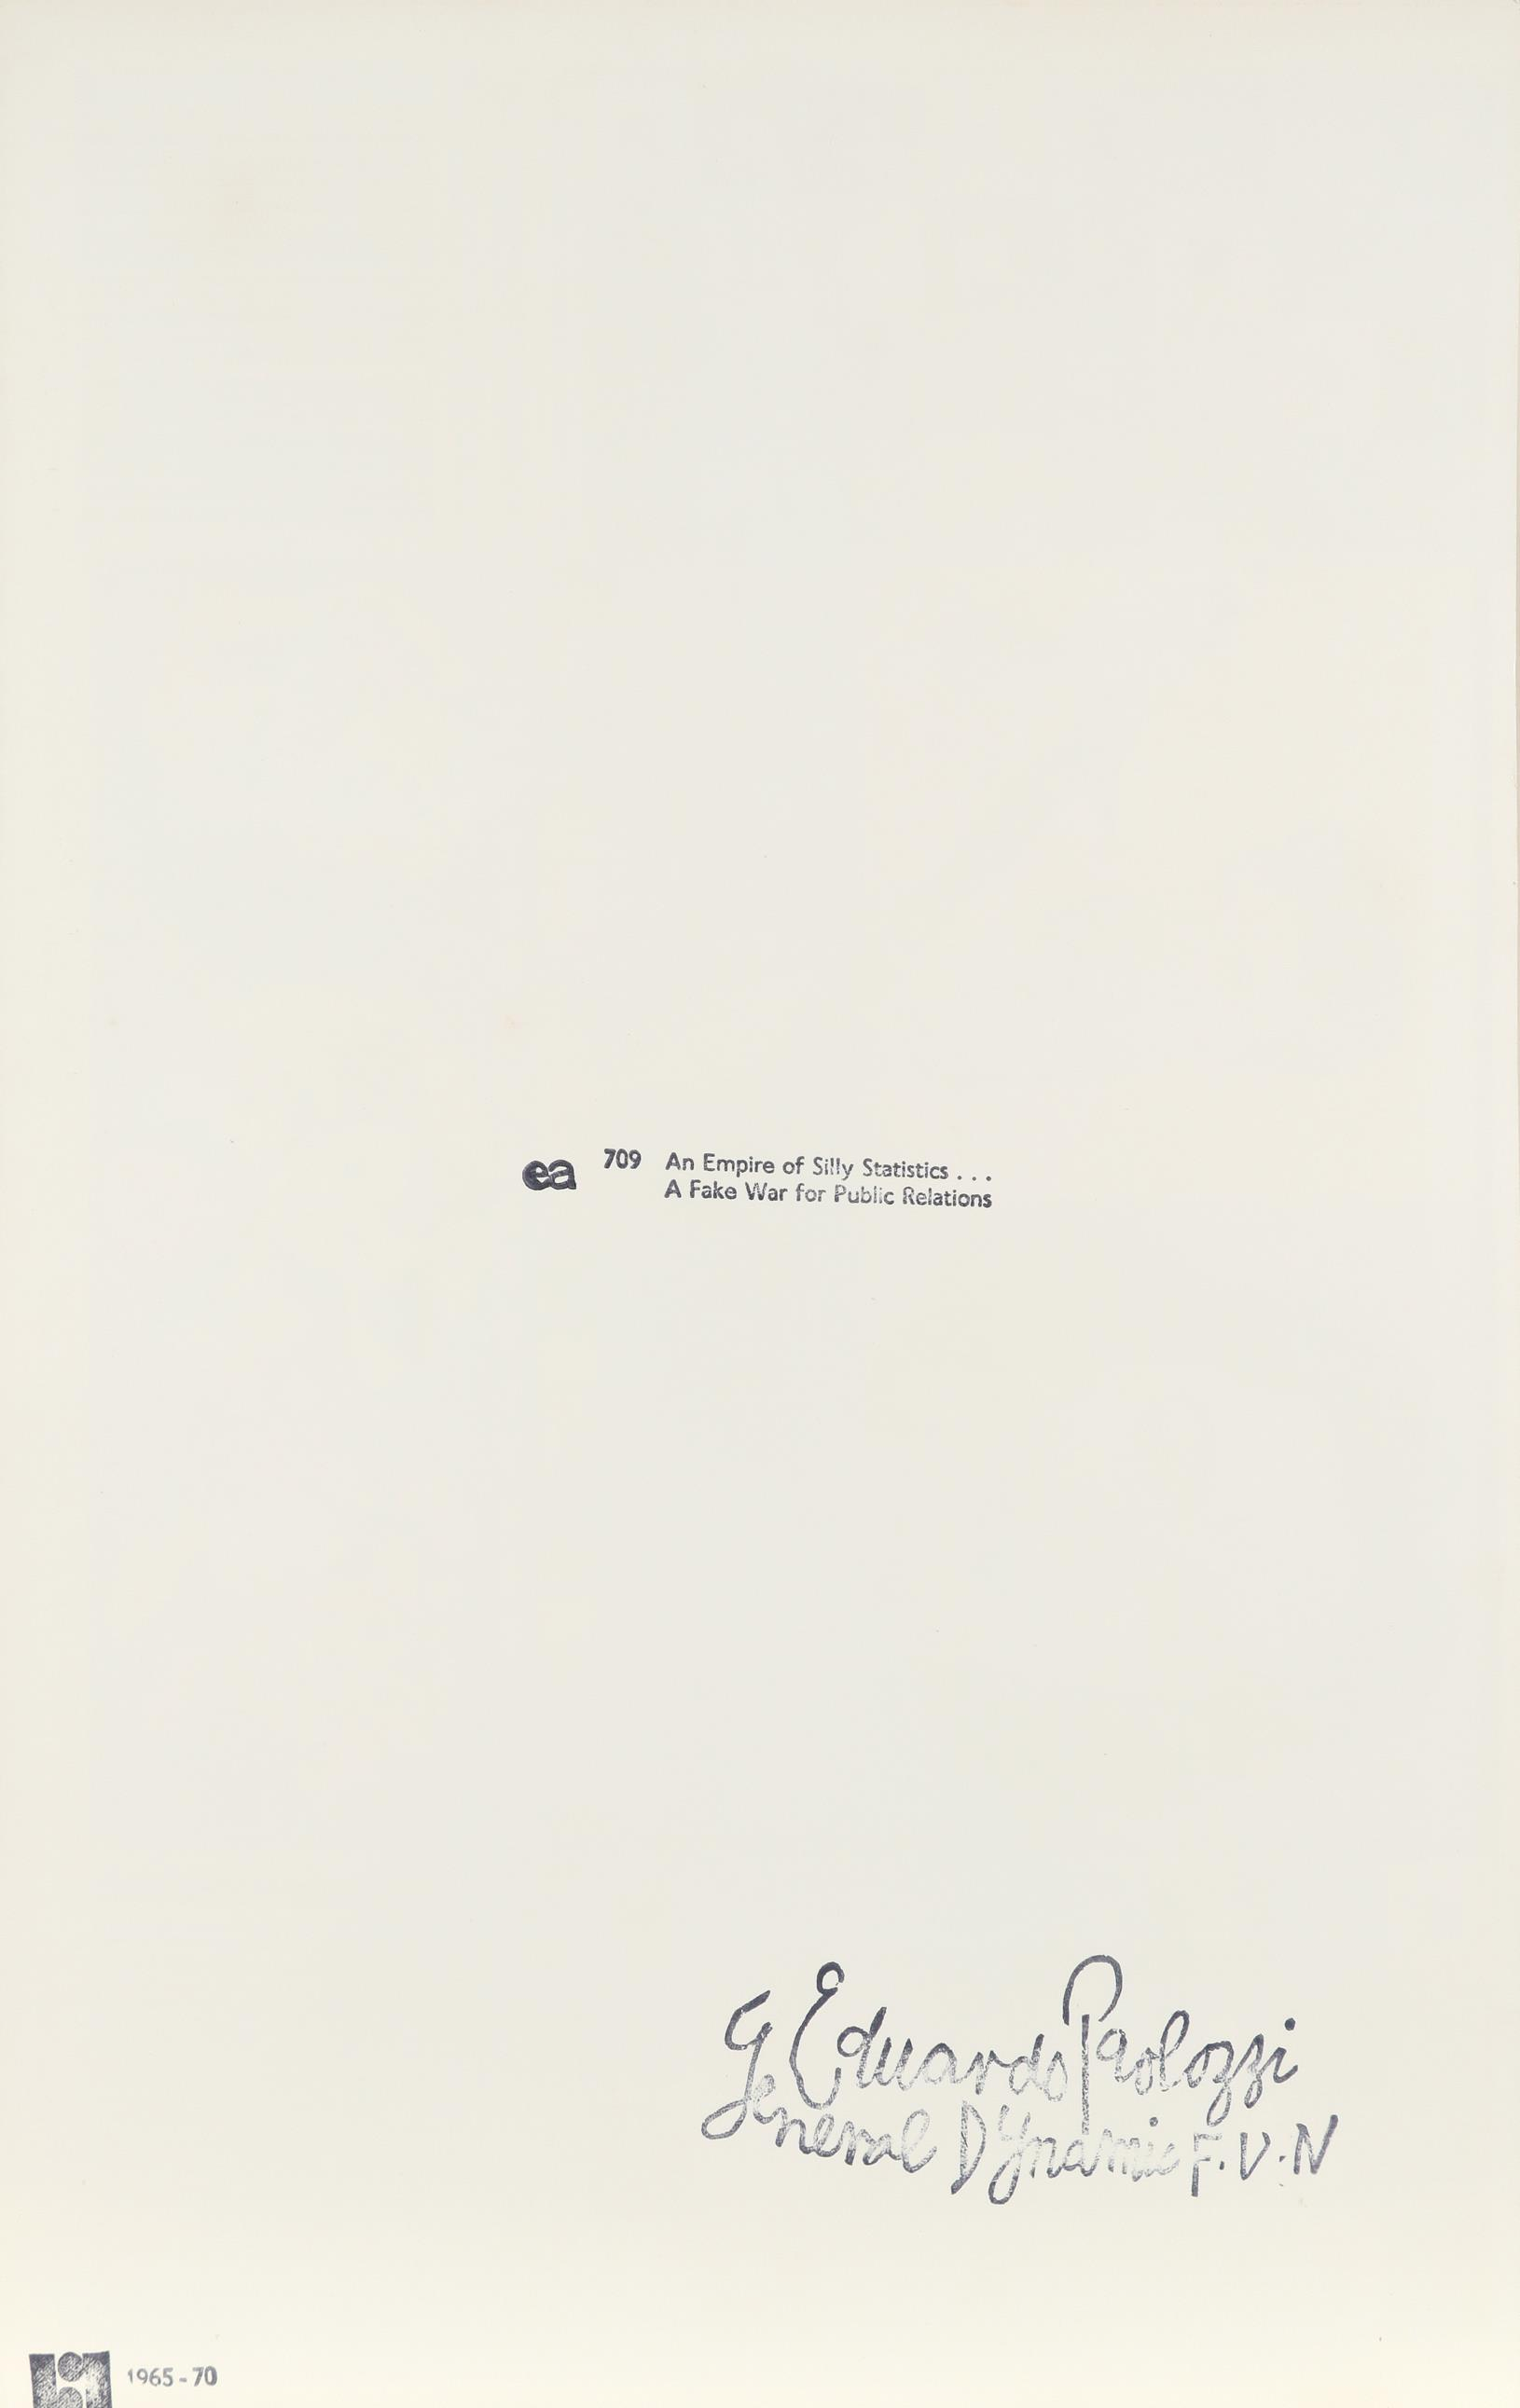 ‡Sir Eduardo Paolozzi CBE, RA (Scottish 1924-2005) General Dynamic F.U.N.: An Empire of Silly - Image 5 of 8